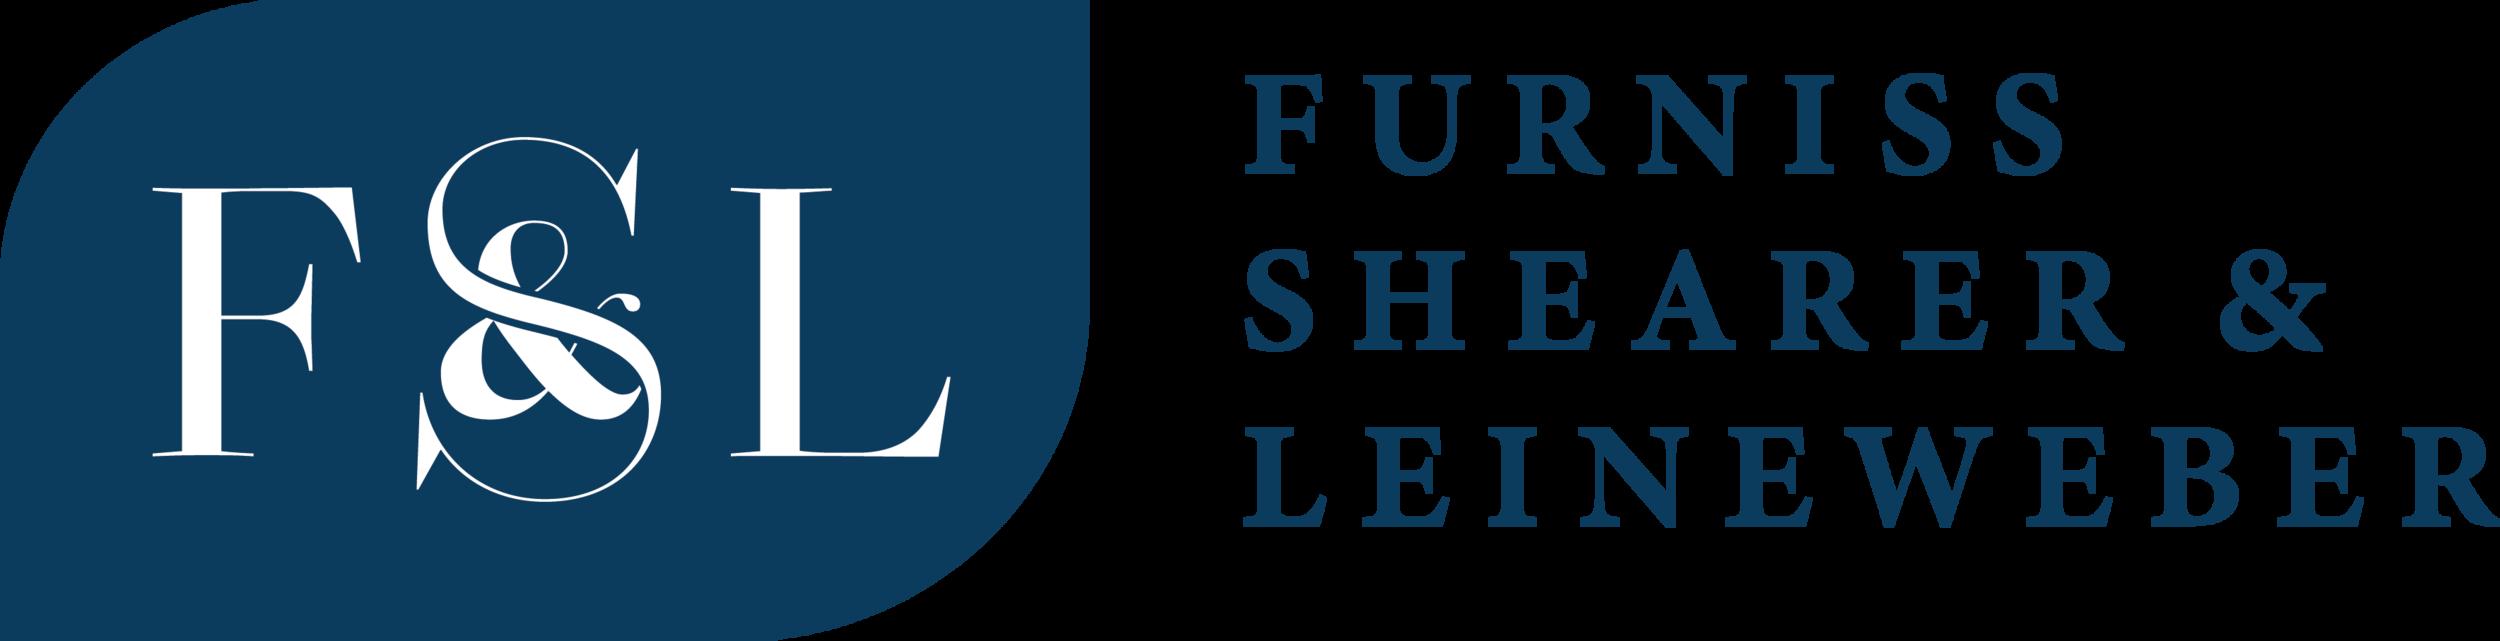 Furniss, Shearer & Leineweber - logo.design.png